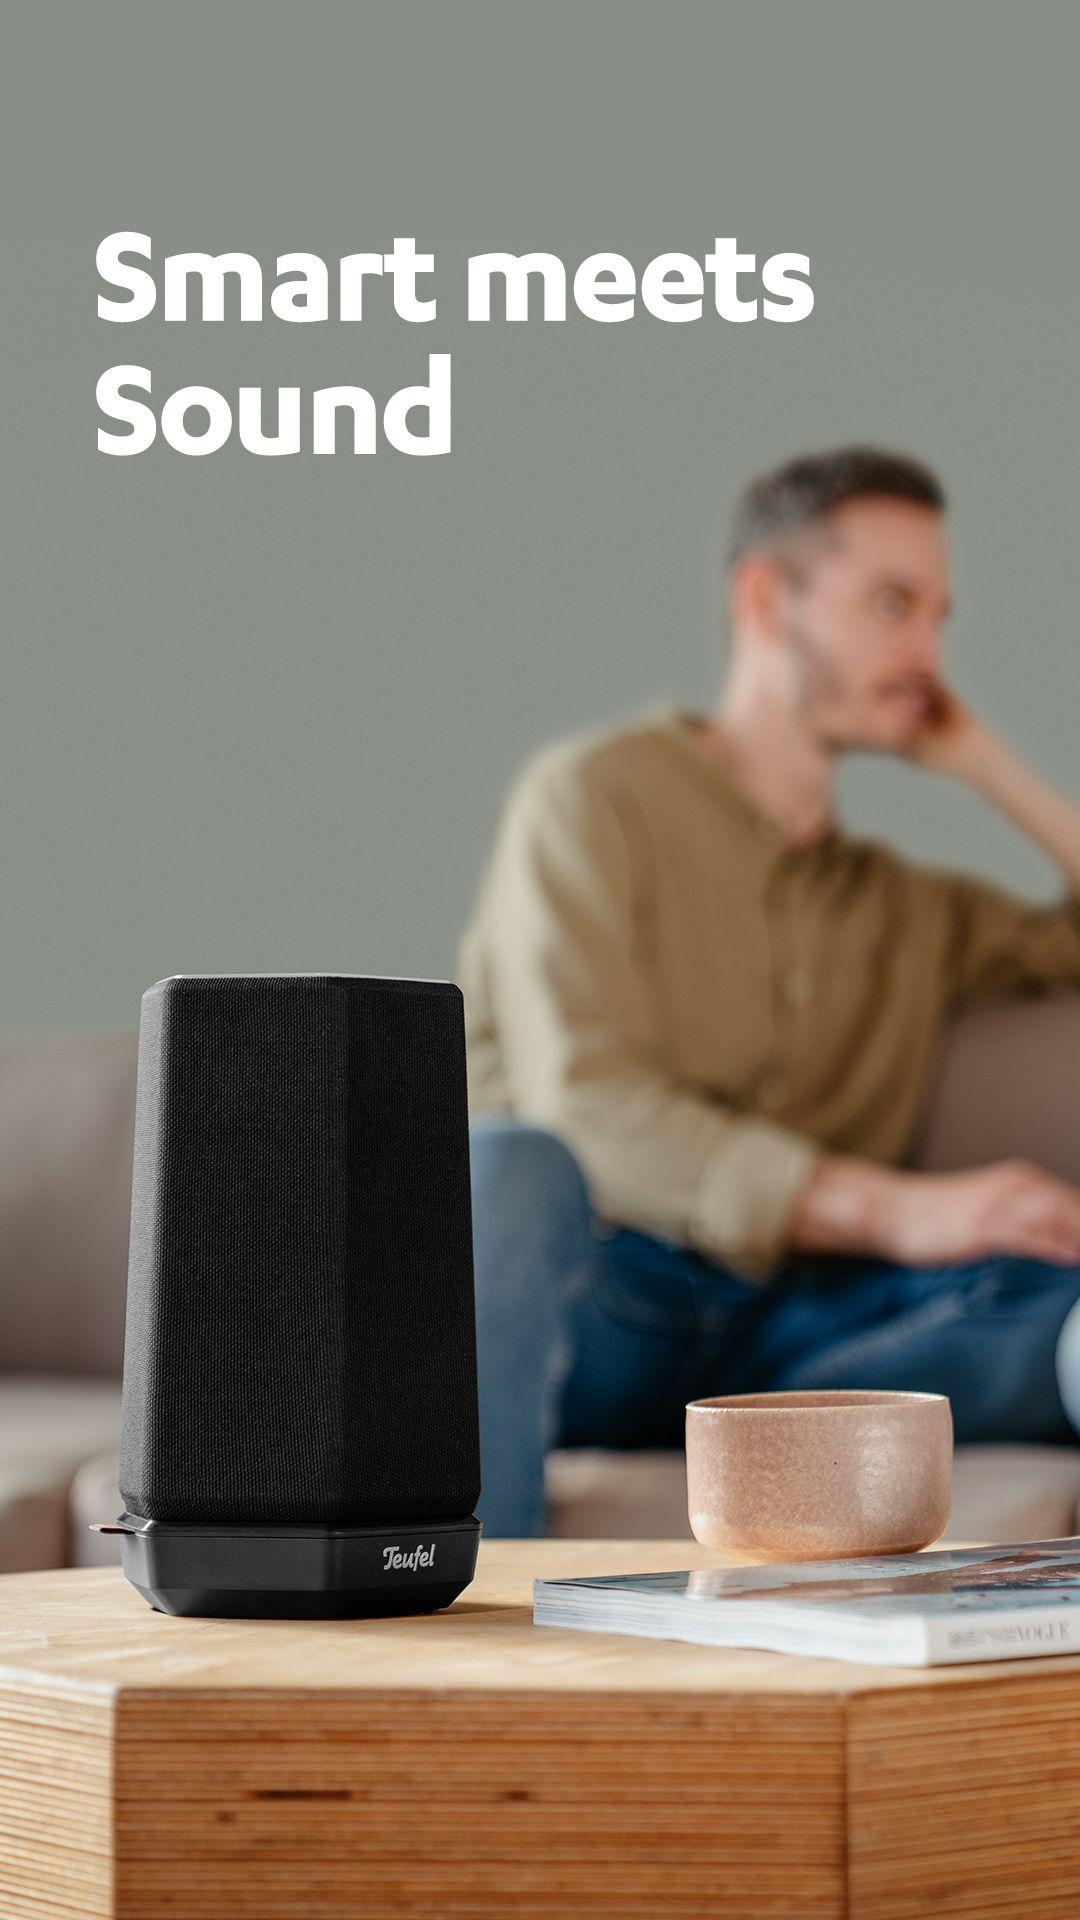 Holist S Smart Home Lautsprecher Mit Alexa Lautsprecher Hifi Musik